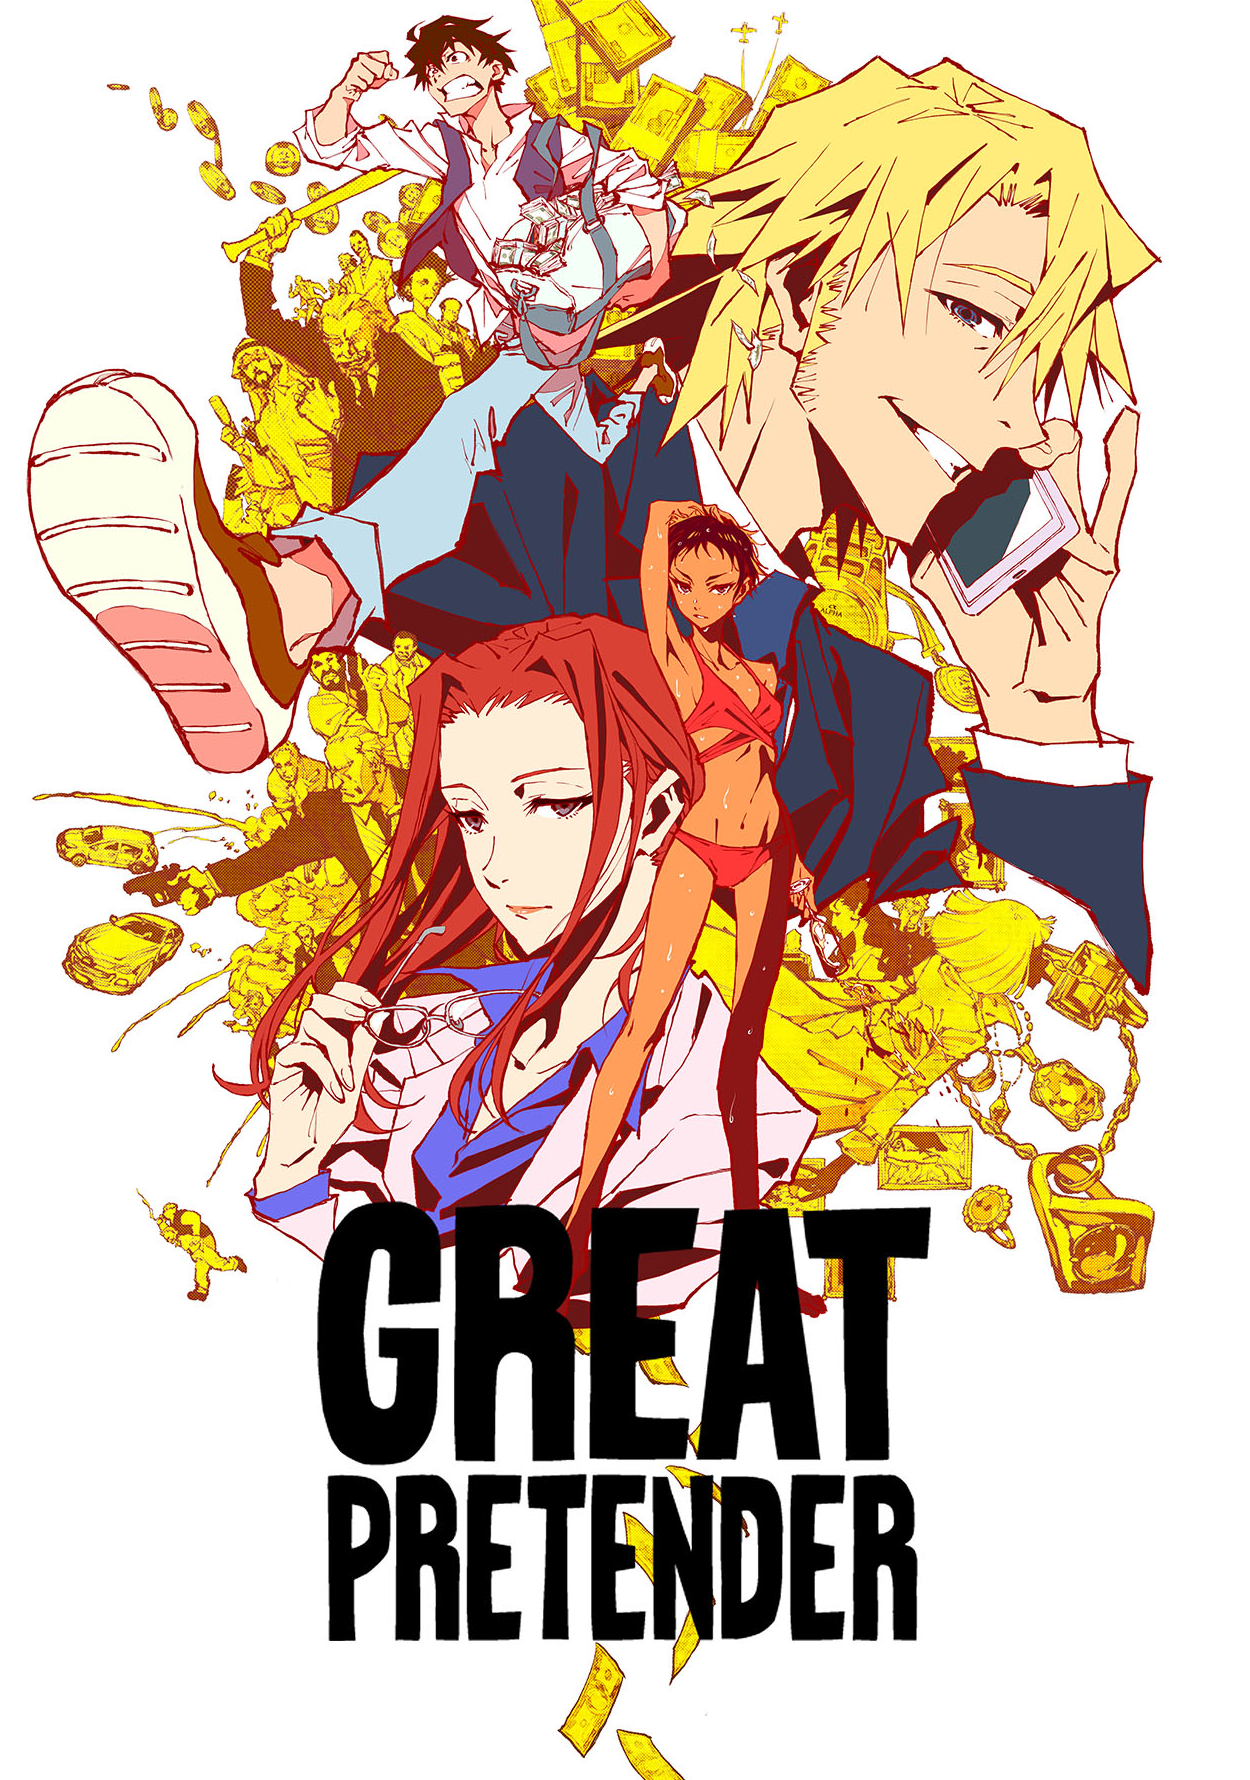 『GREAT PRETENDER』CASE4 Blu-ray 発売決定!